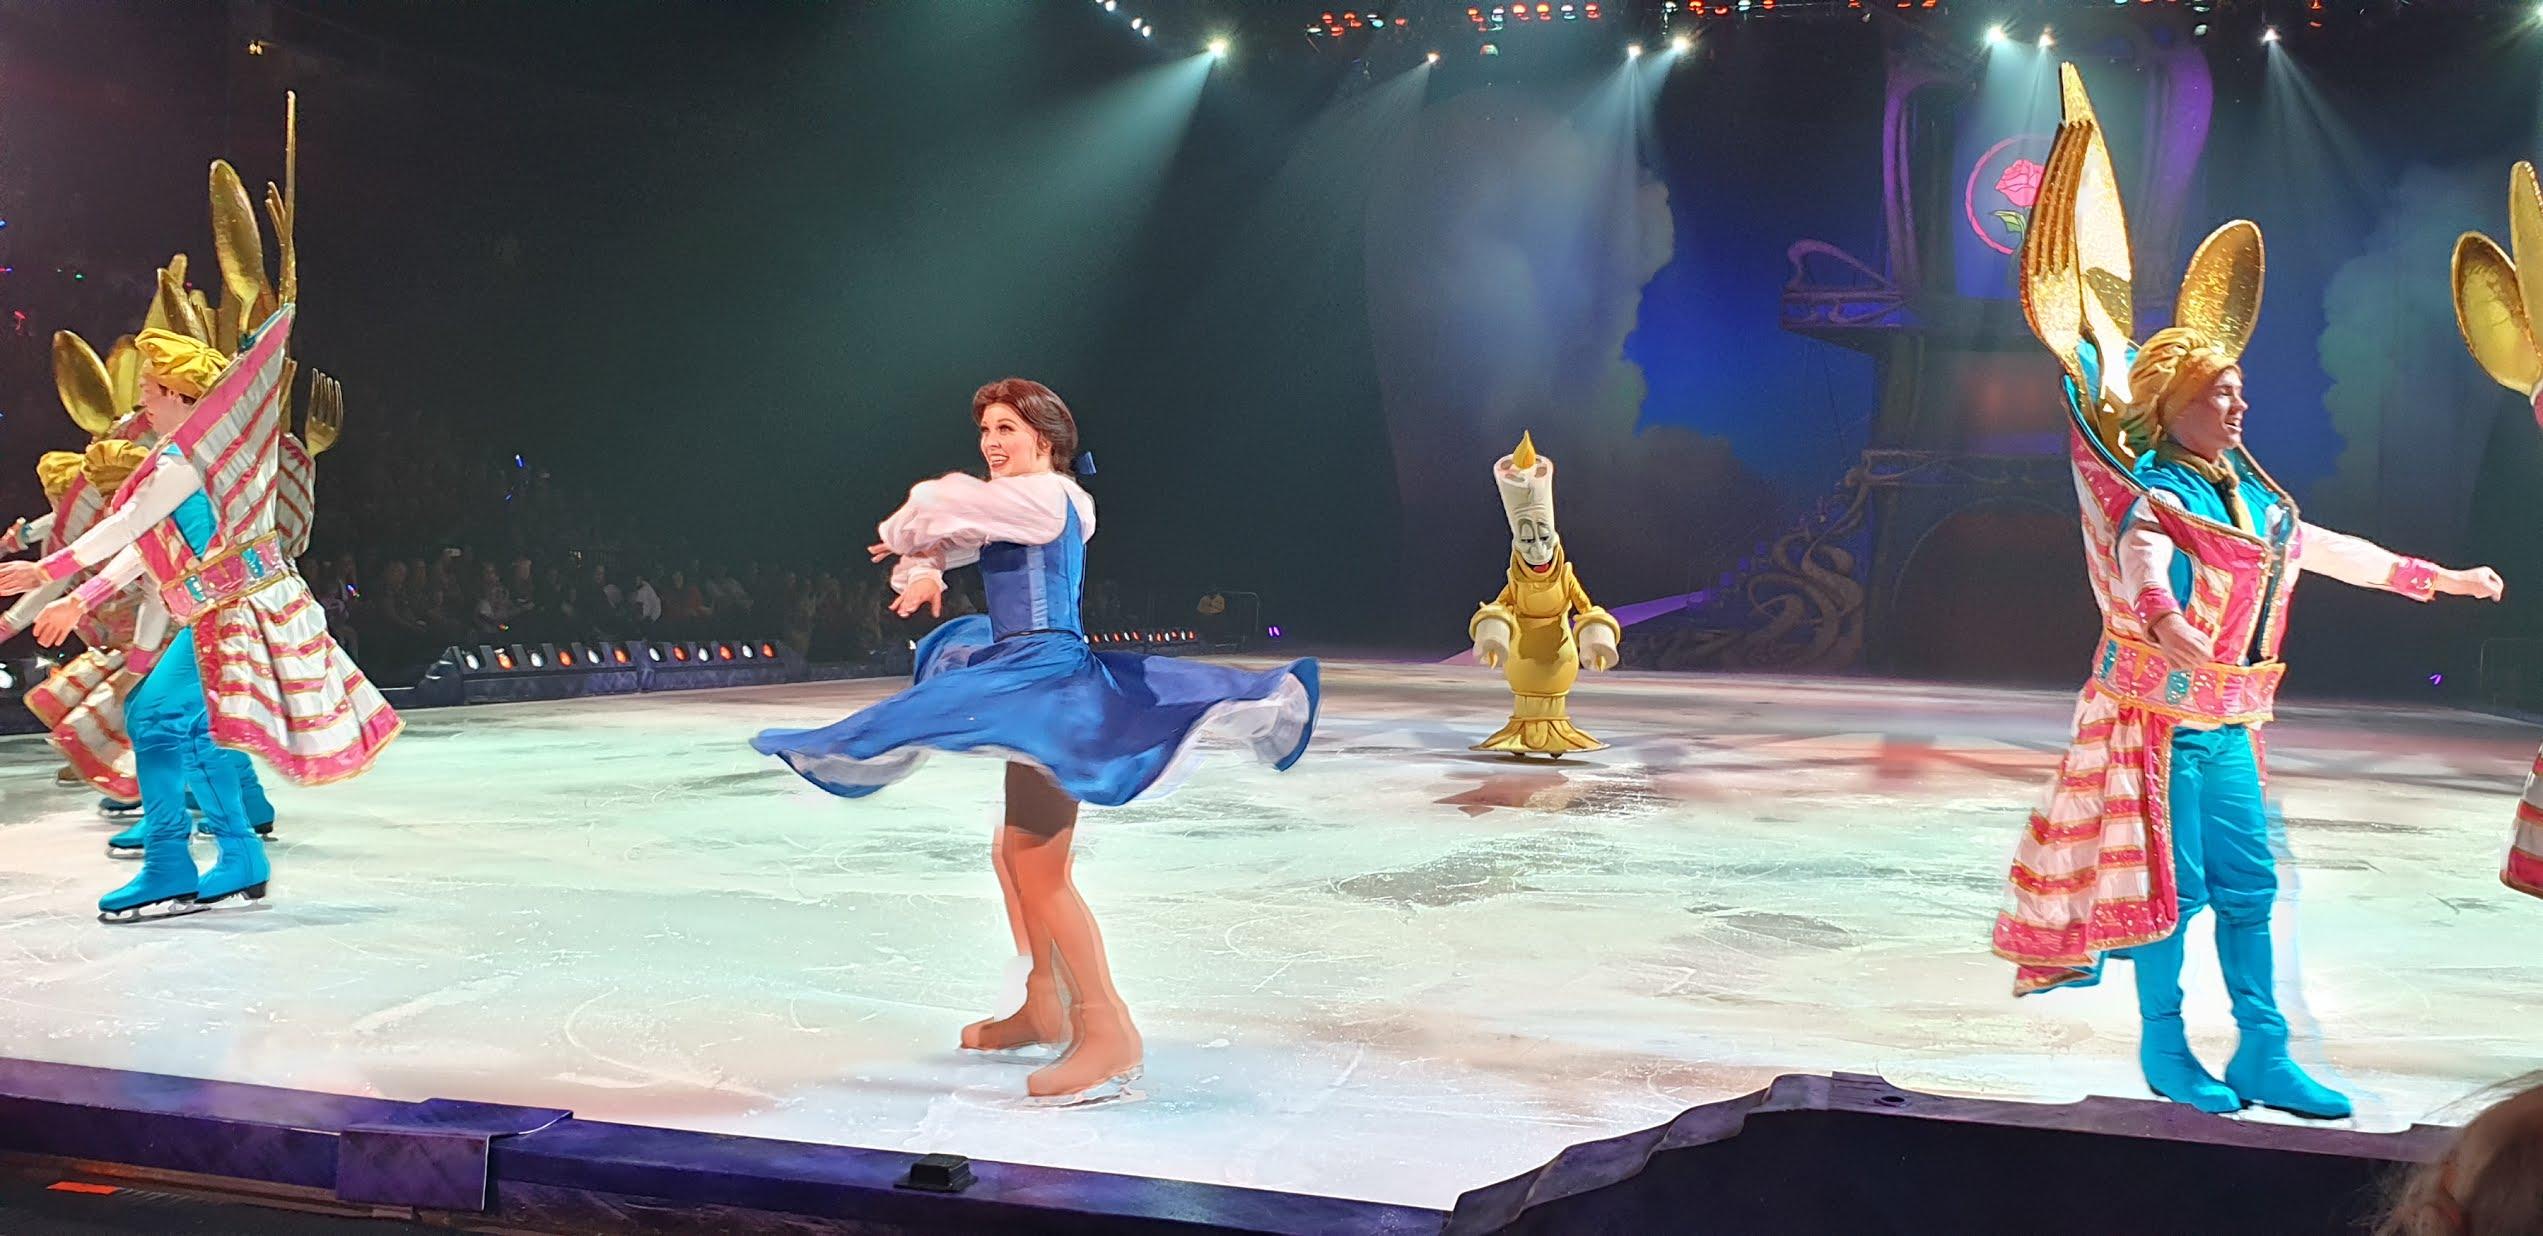 belle skating on ice